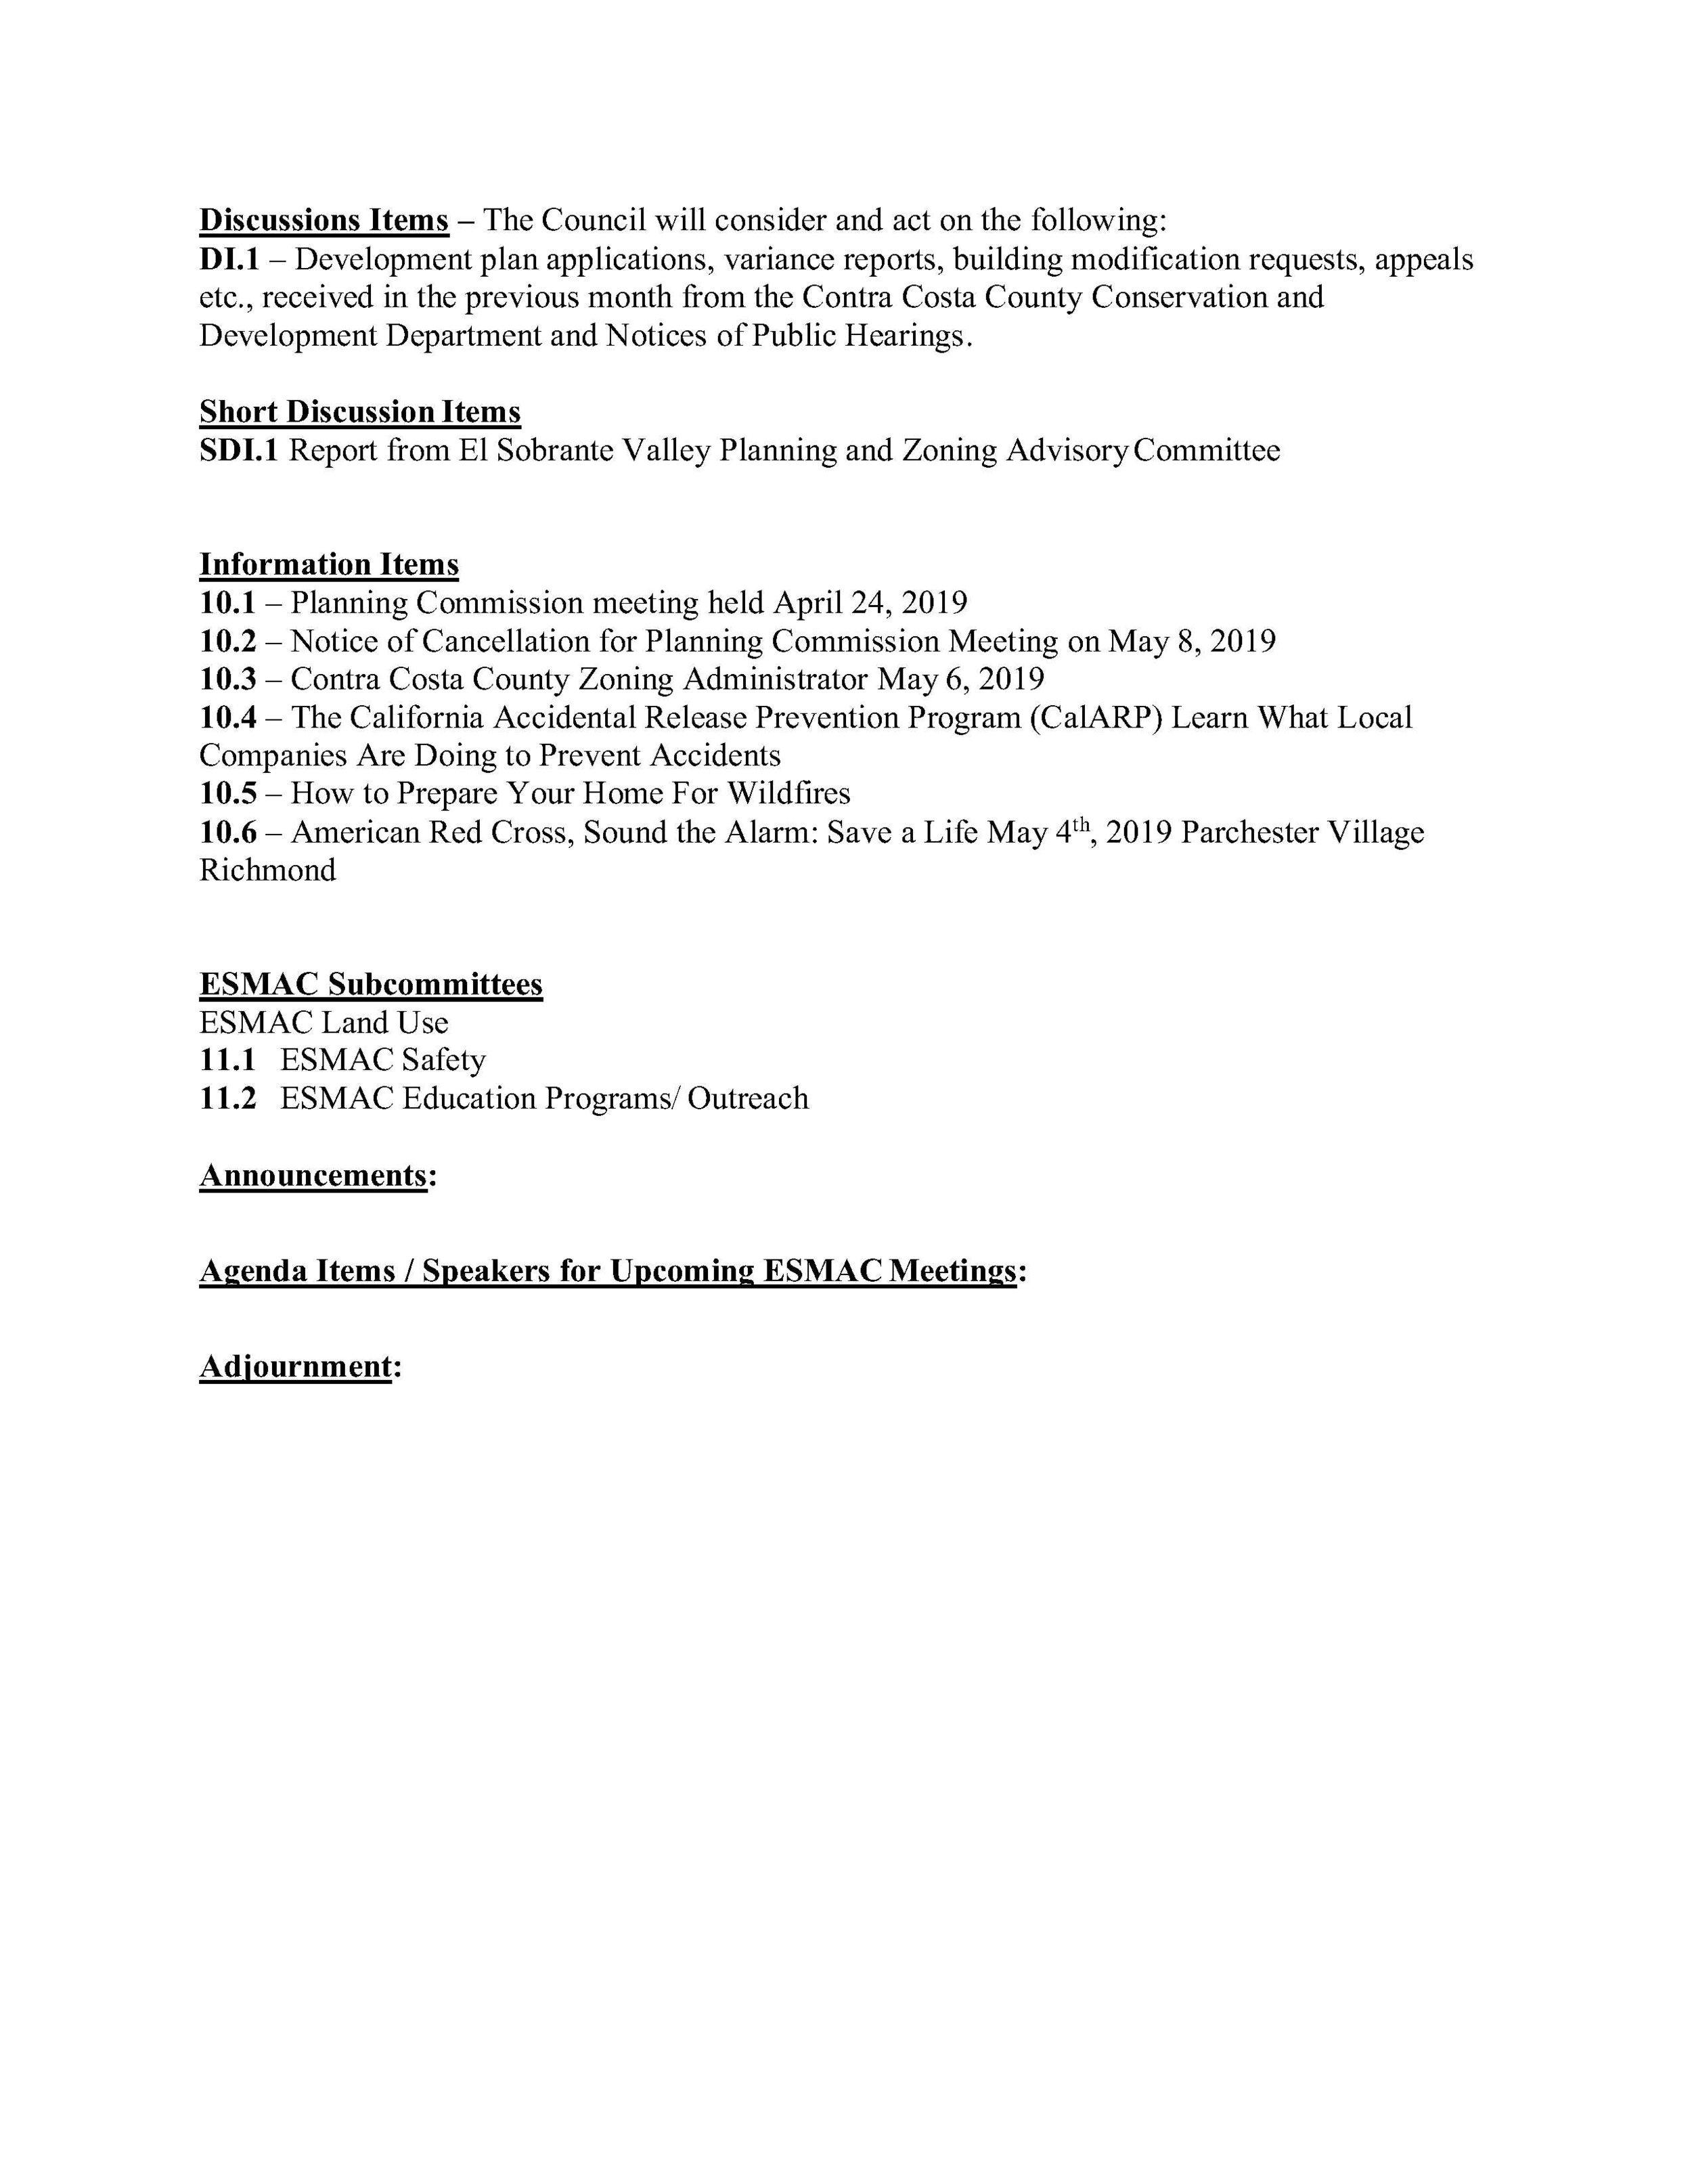 ESMAC Agenda 5.8.2019b_2.jpg